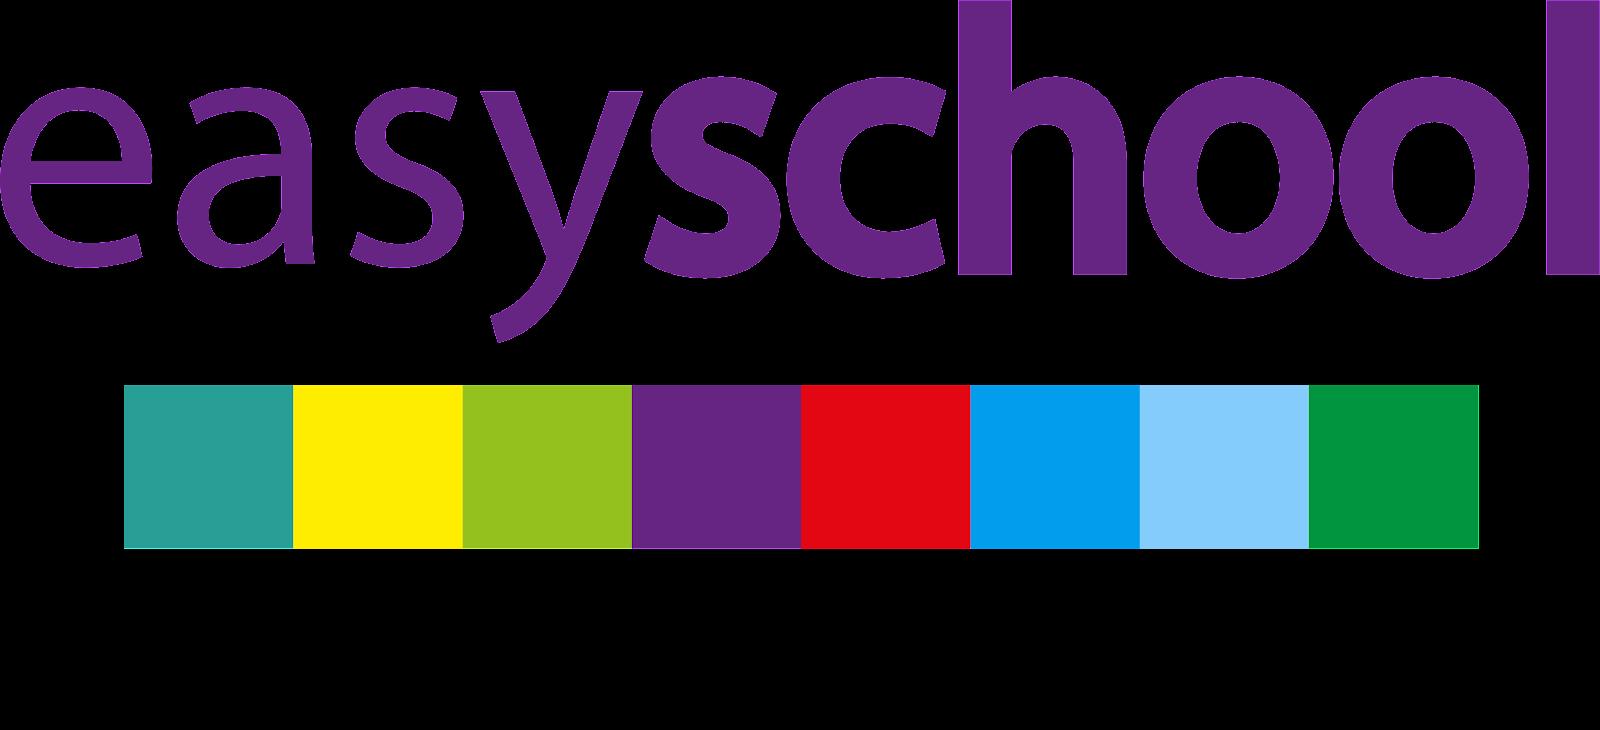 SalzFRH7TfUQF6niuVrPYg-easyschool.png